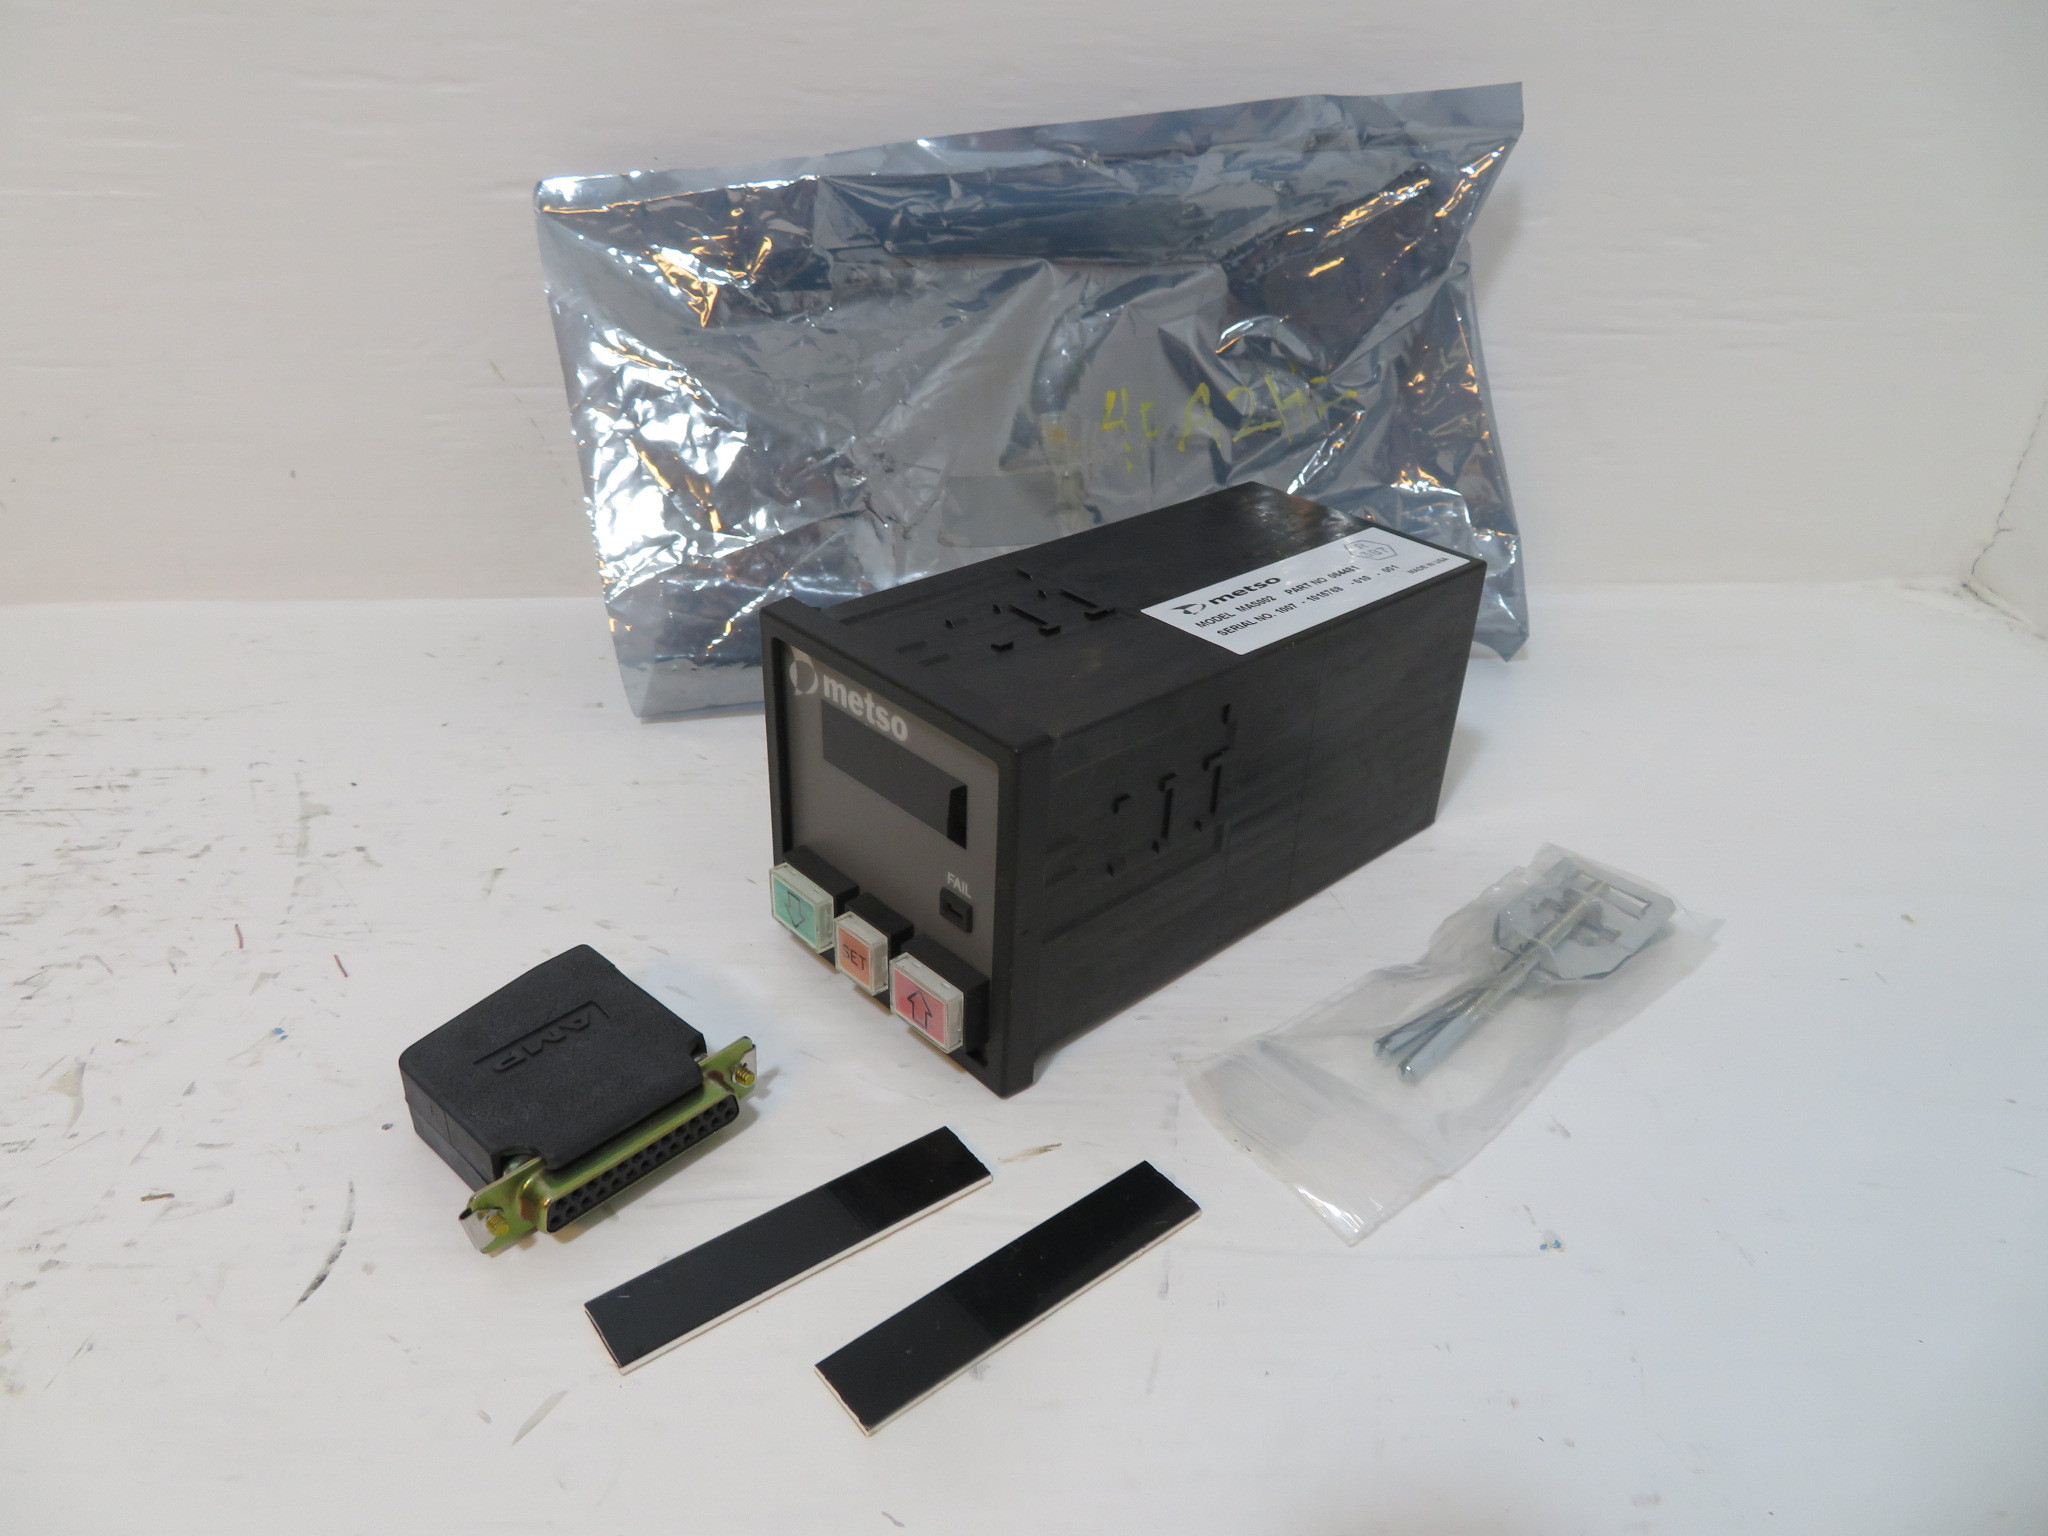 NEW Valmet Metso Automation MAS002 PLC Interface 064481 Manual Auto Station  MAS (NP2420-1)